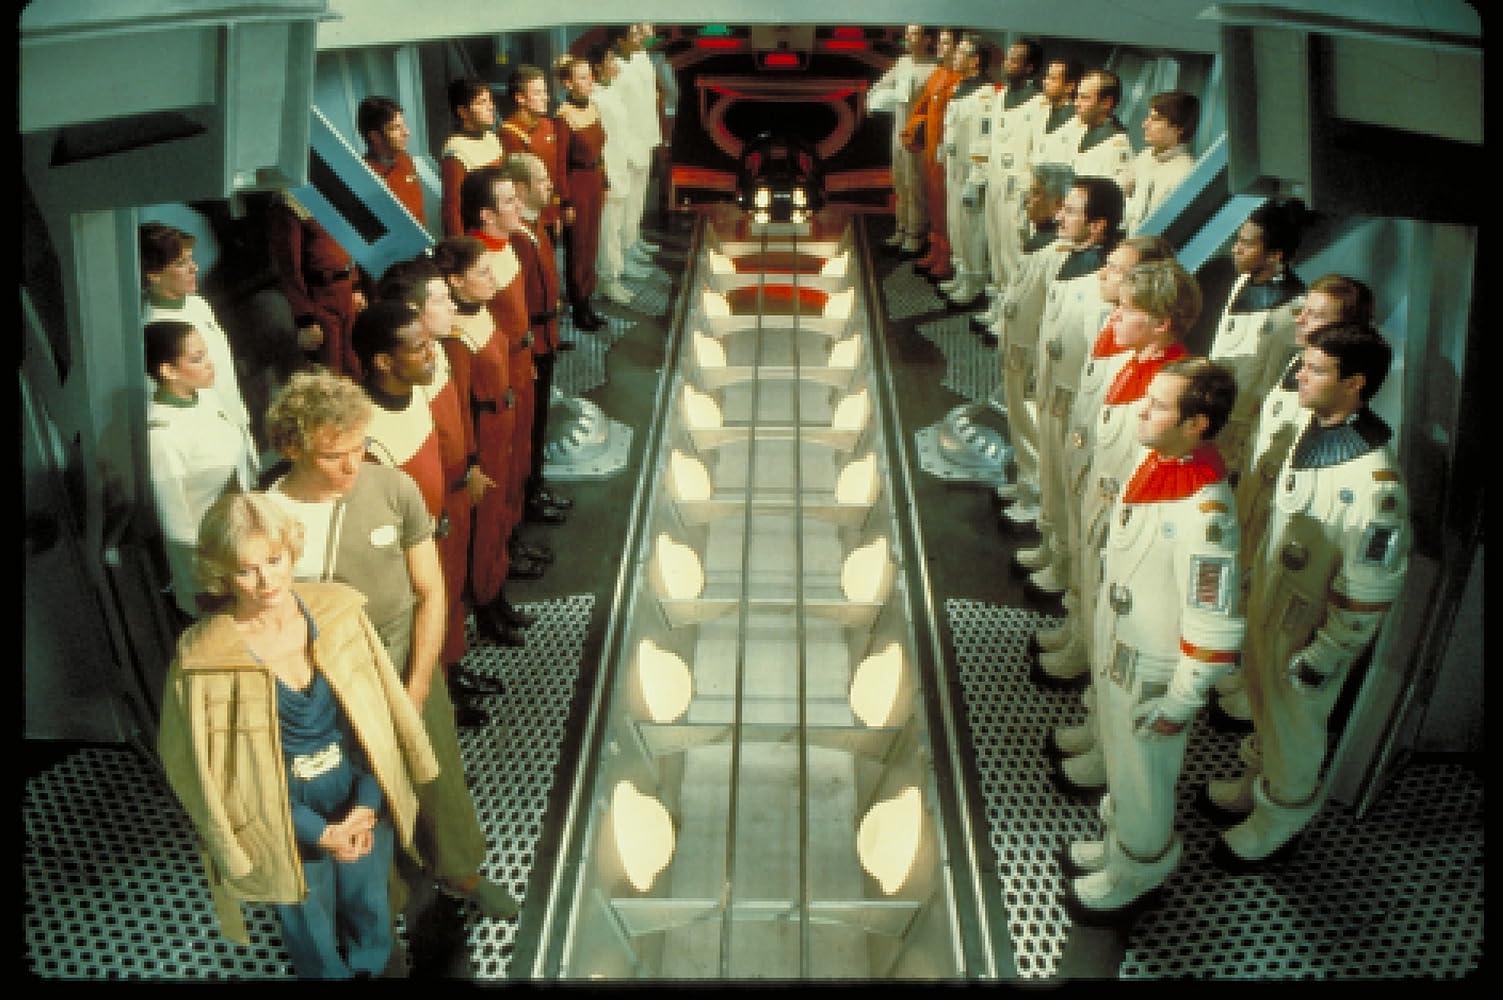 Bibi Besch Merritt Butrick Kevin Rodney Sullivan and Philip Weyland in Star Trek II The Wrath of Khan 1982